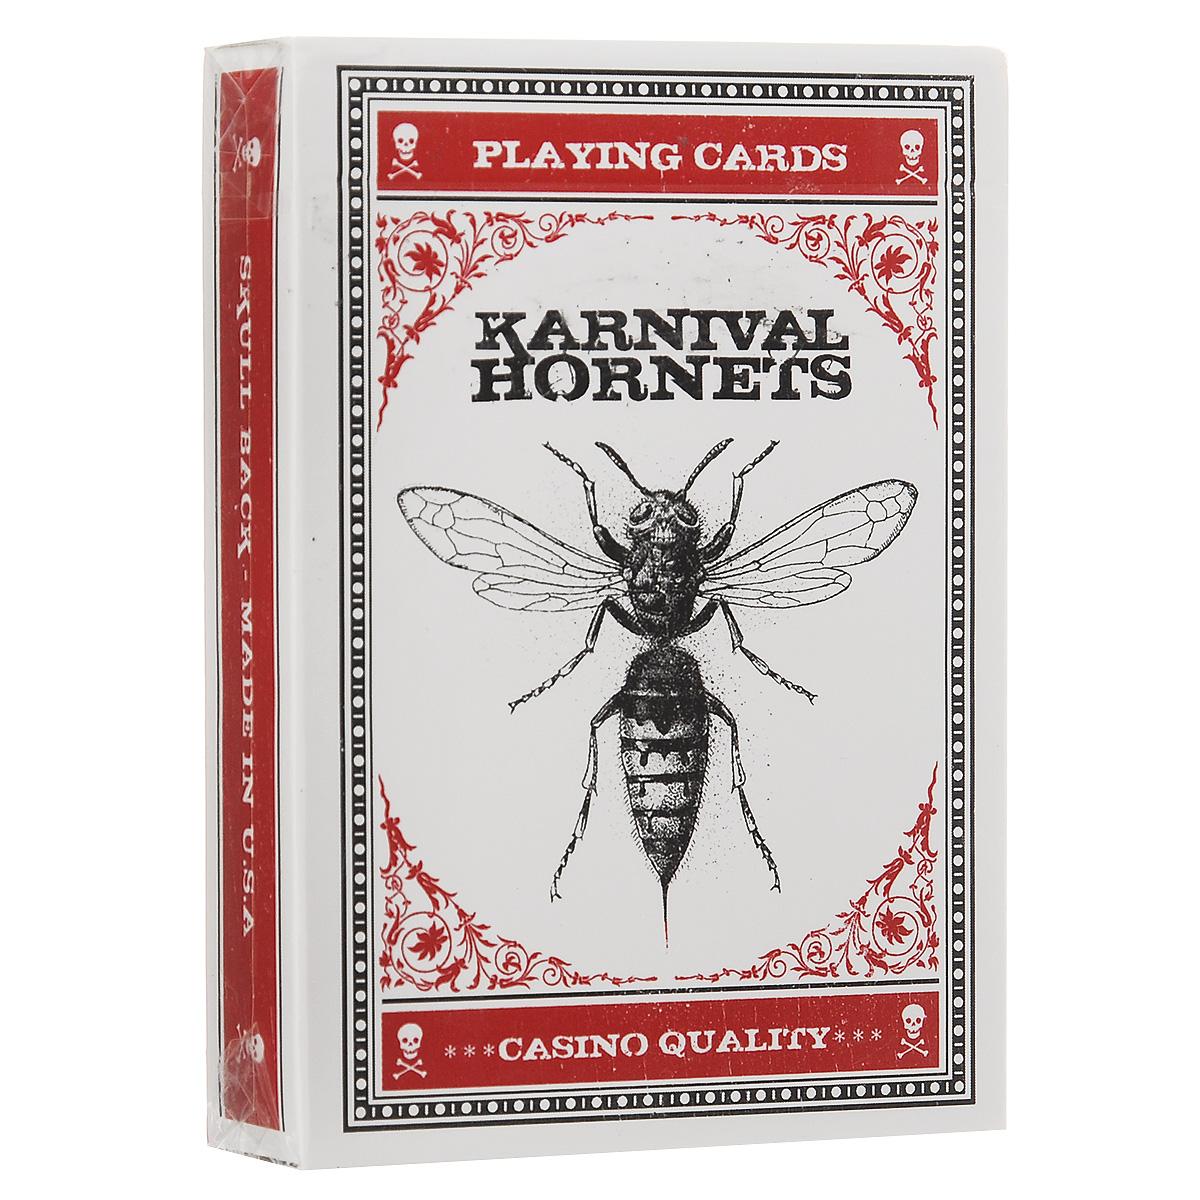 Игральные карты Karnival